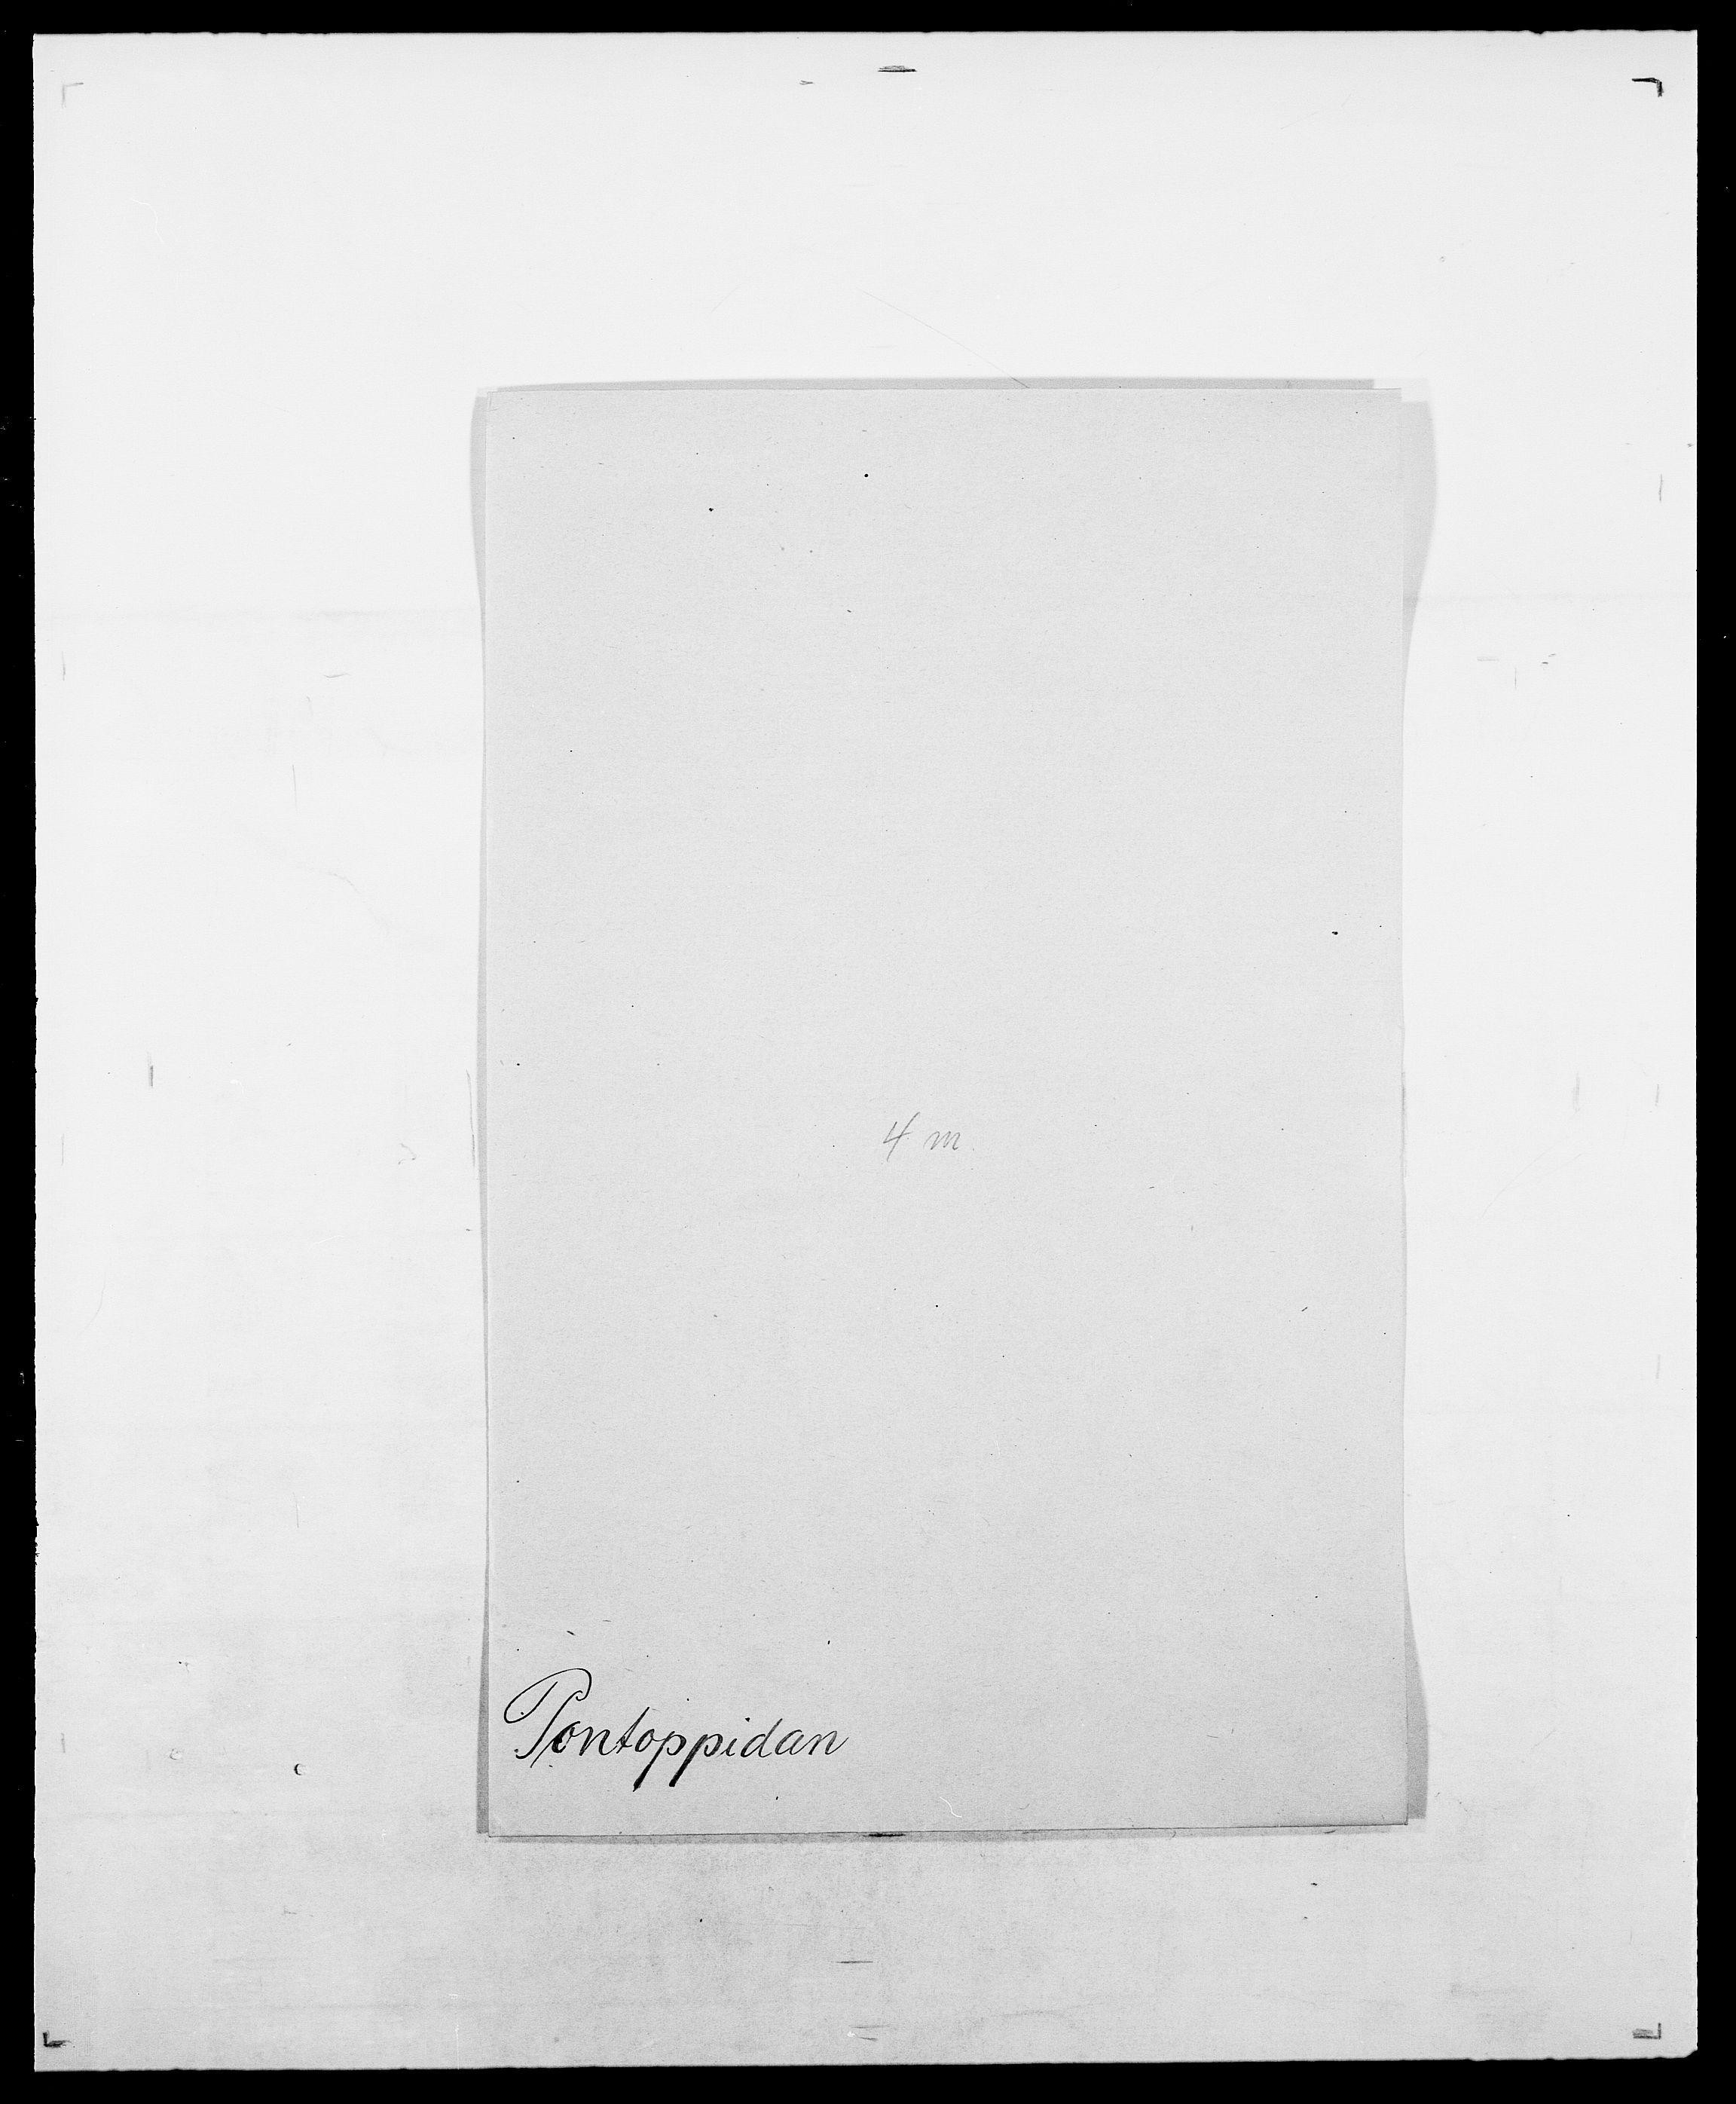 SAO, Delgobe, Charles Antoine - samling, D/Da/L0031: de Place - Raaum, s. 209